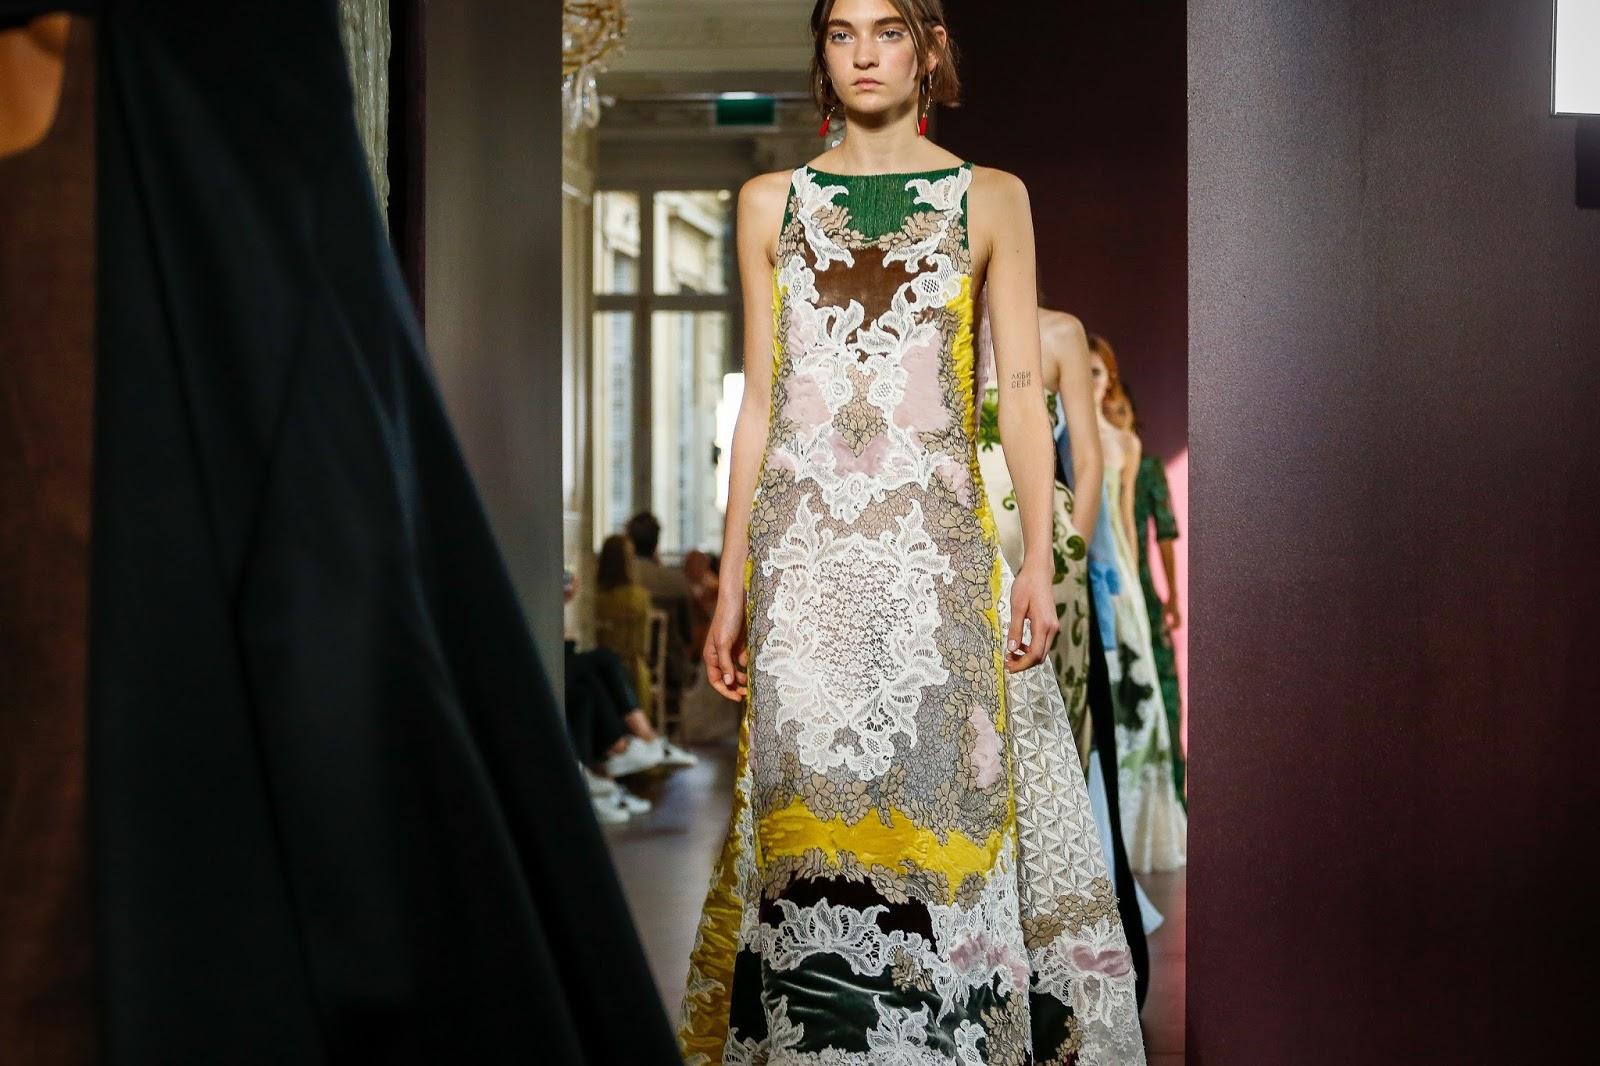 Valentino's Haute Couture Autumn/Winter 17 Show & BTS Videos